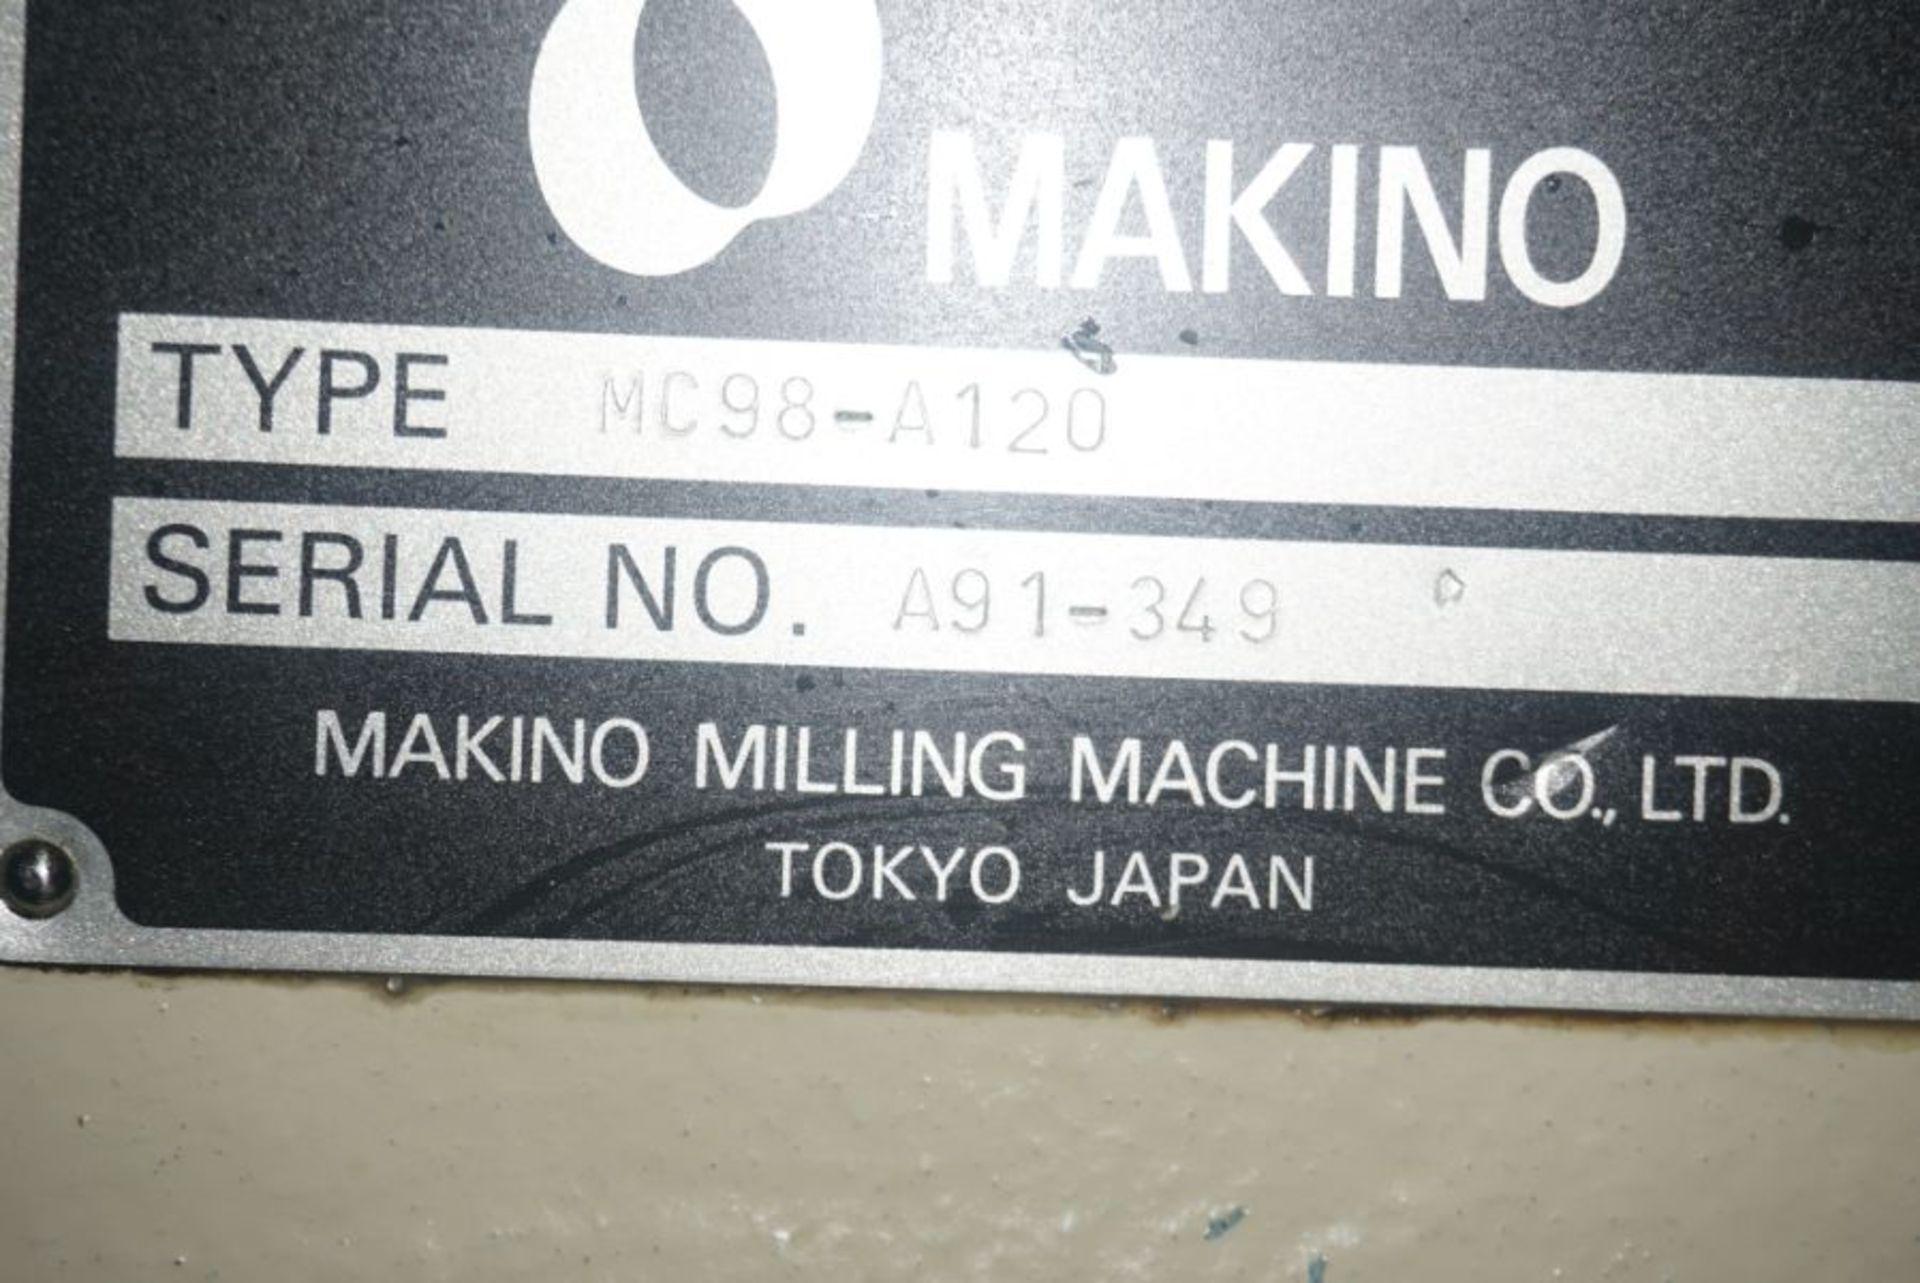 Makino MC98-A120 4-Axis Horizontal Machining Center, Fanuc 16 Pro 3 Control, New 1990 - Image 8 of 8